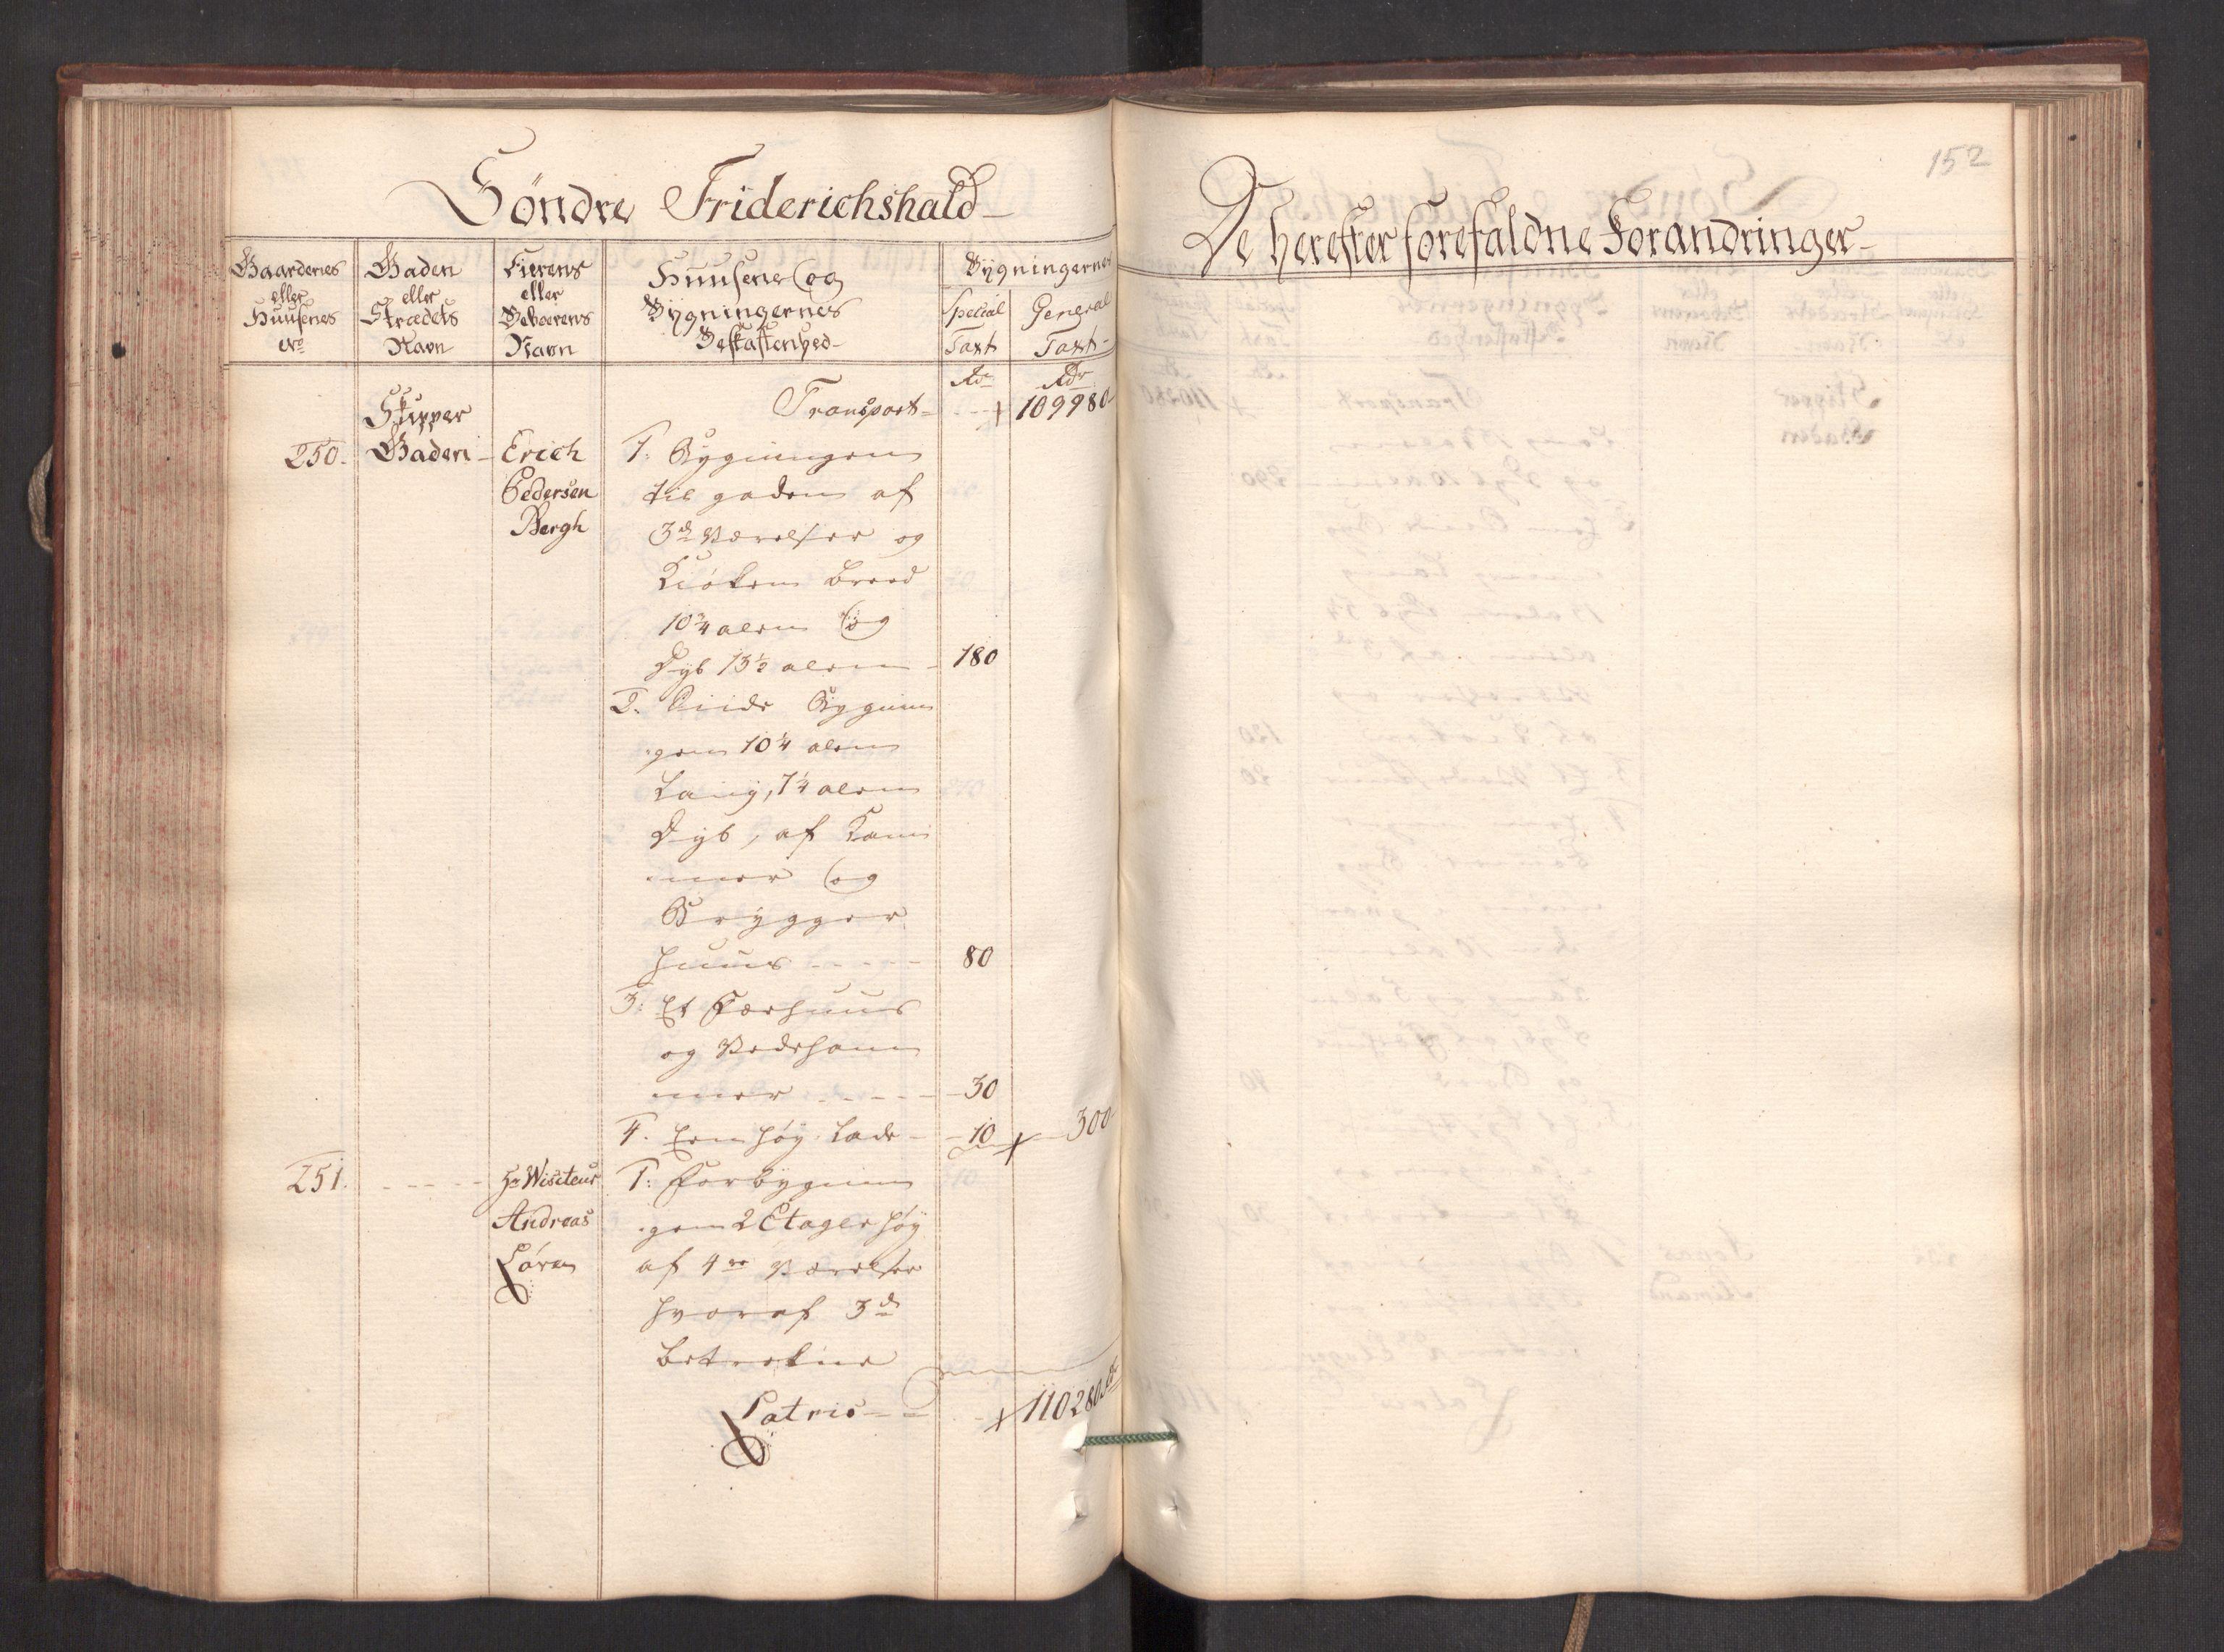 RA, Kommersekollegiet, Brannforsikringskontoret 1767-1814, F/Fa/L0023: Fredrikshald, 1767